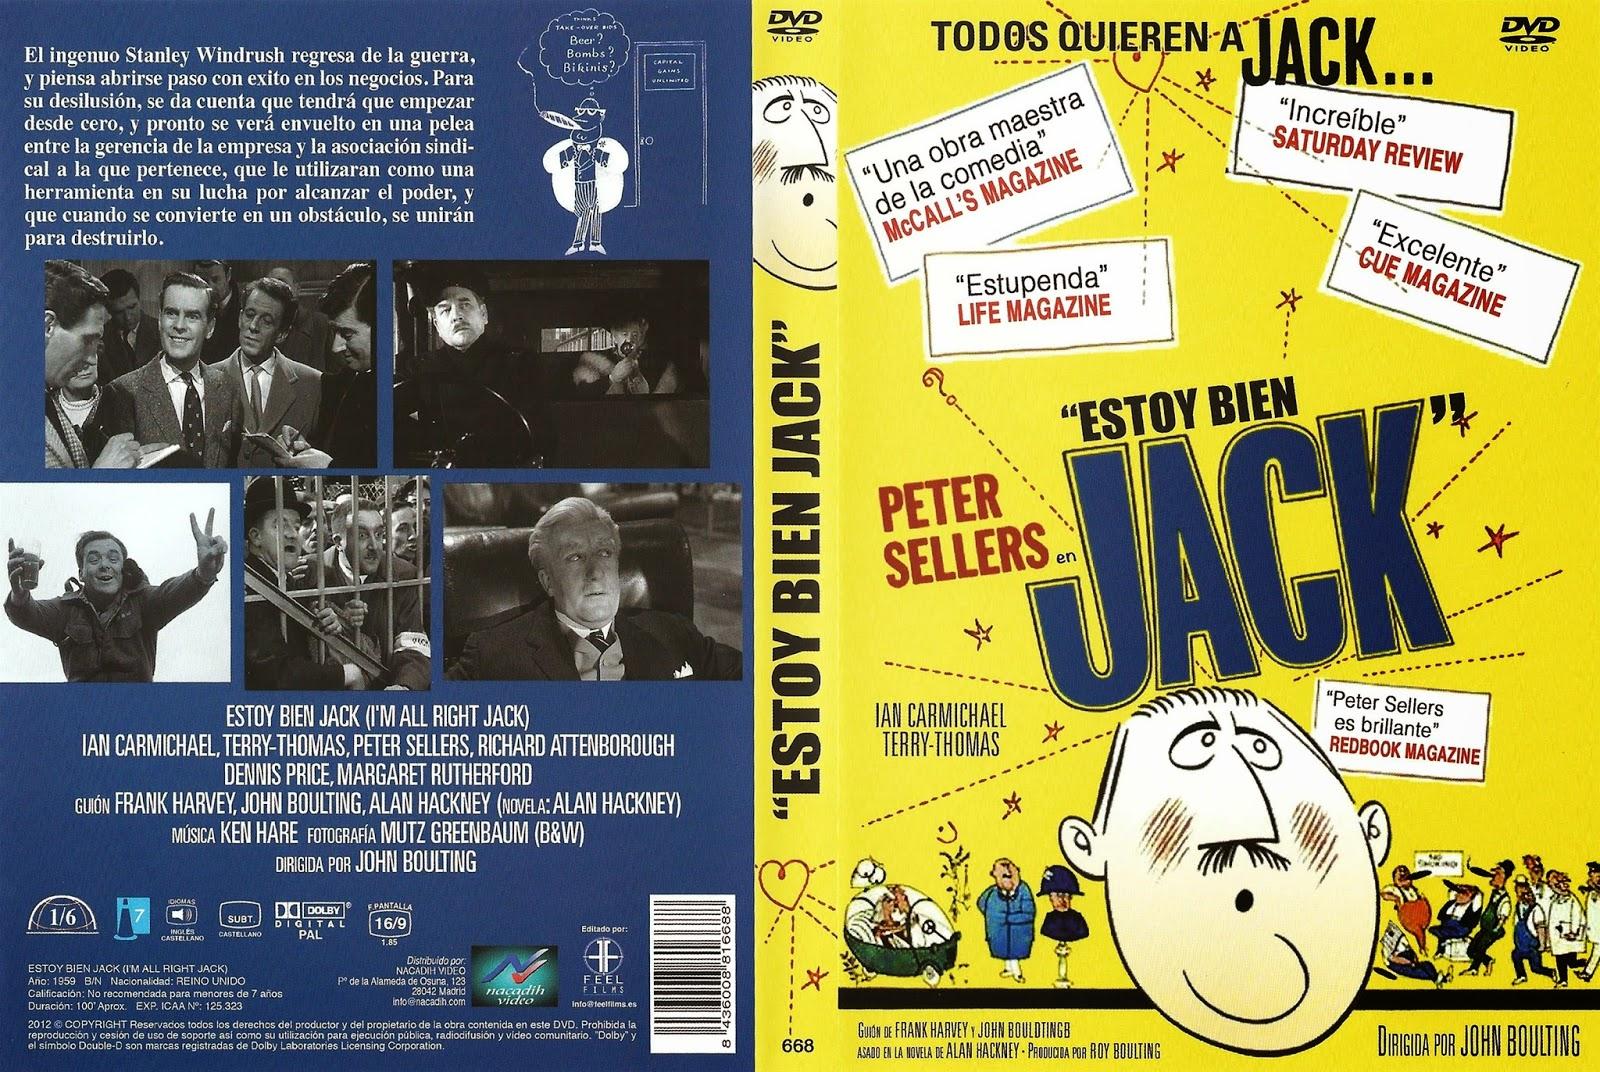 Carátula: Estoy bien, Jack (I'm All Right Jack) (1959)